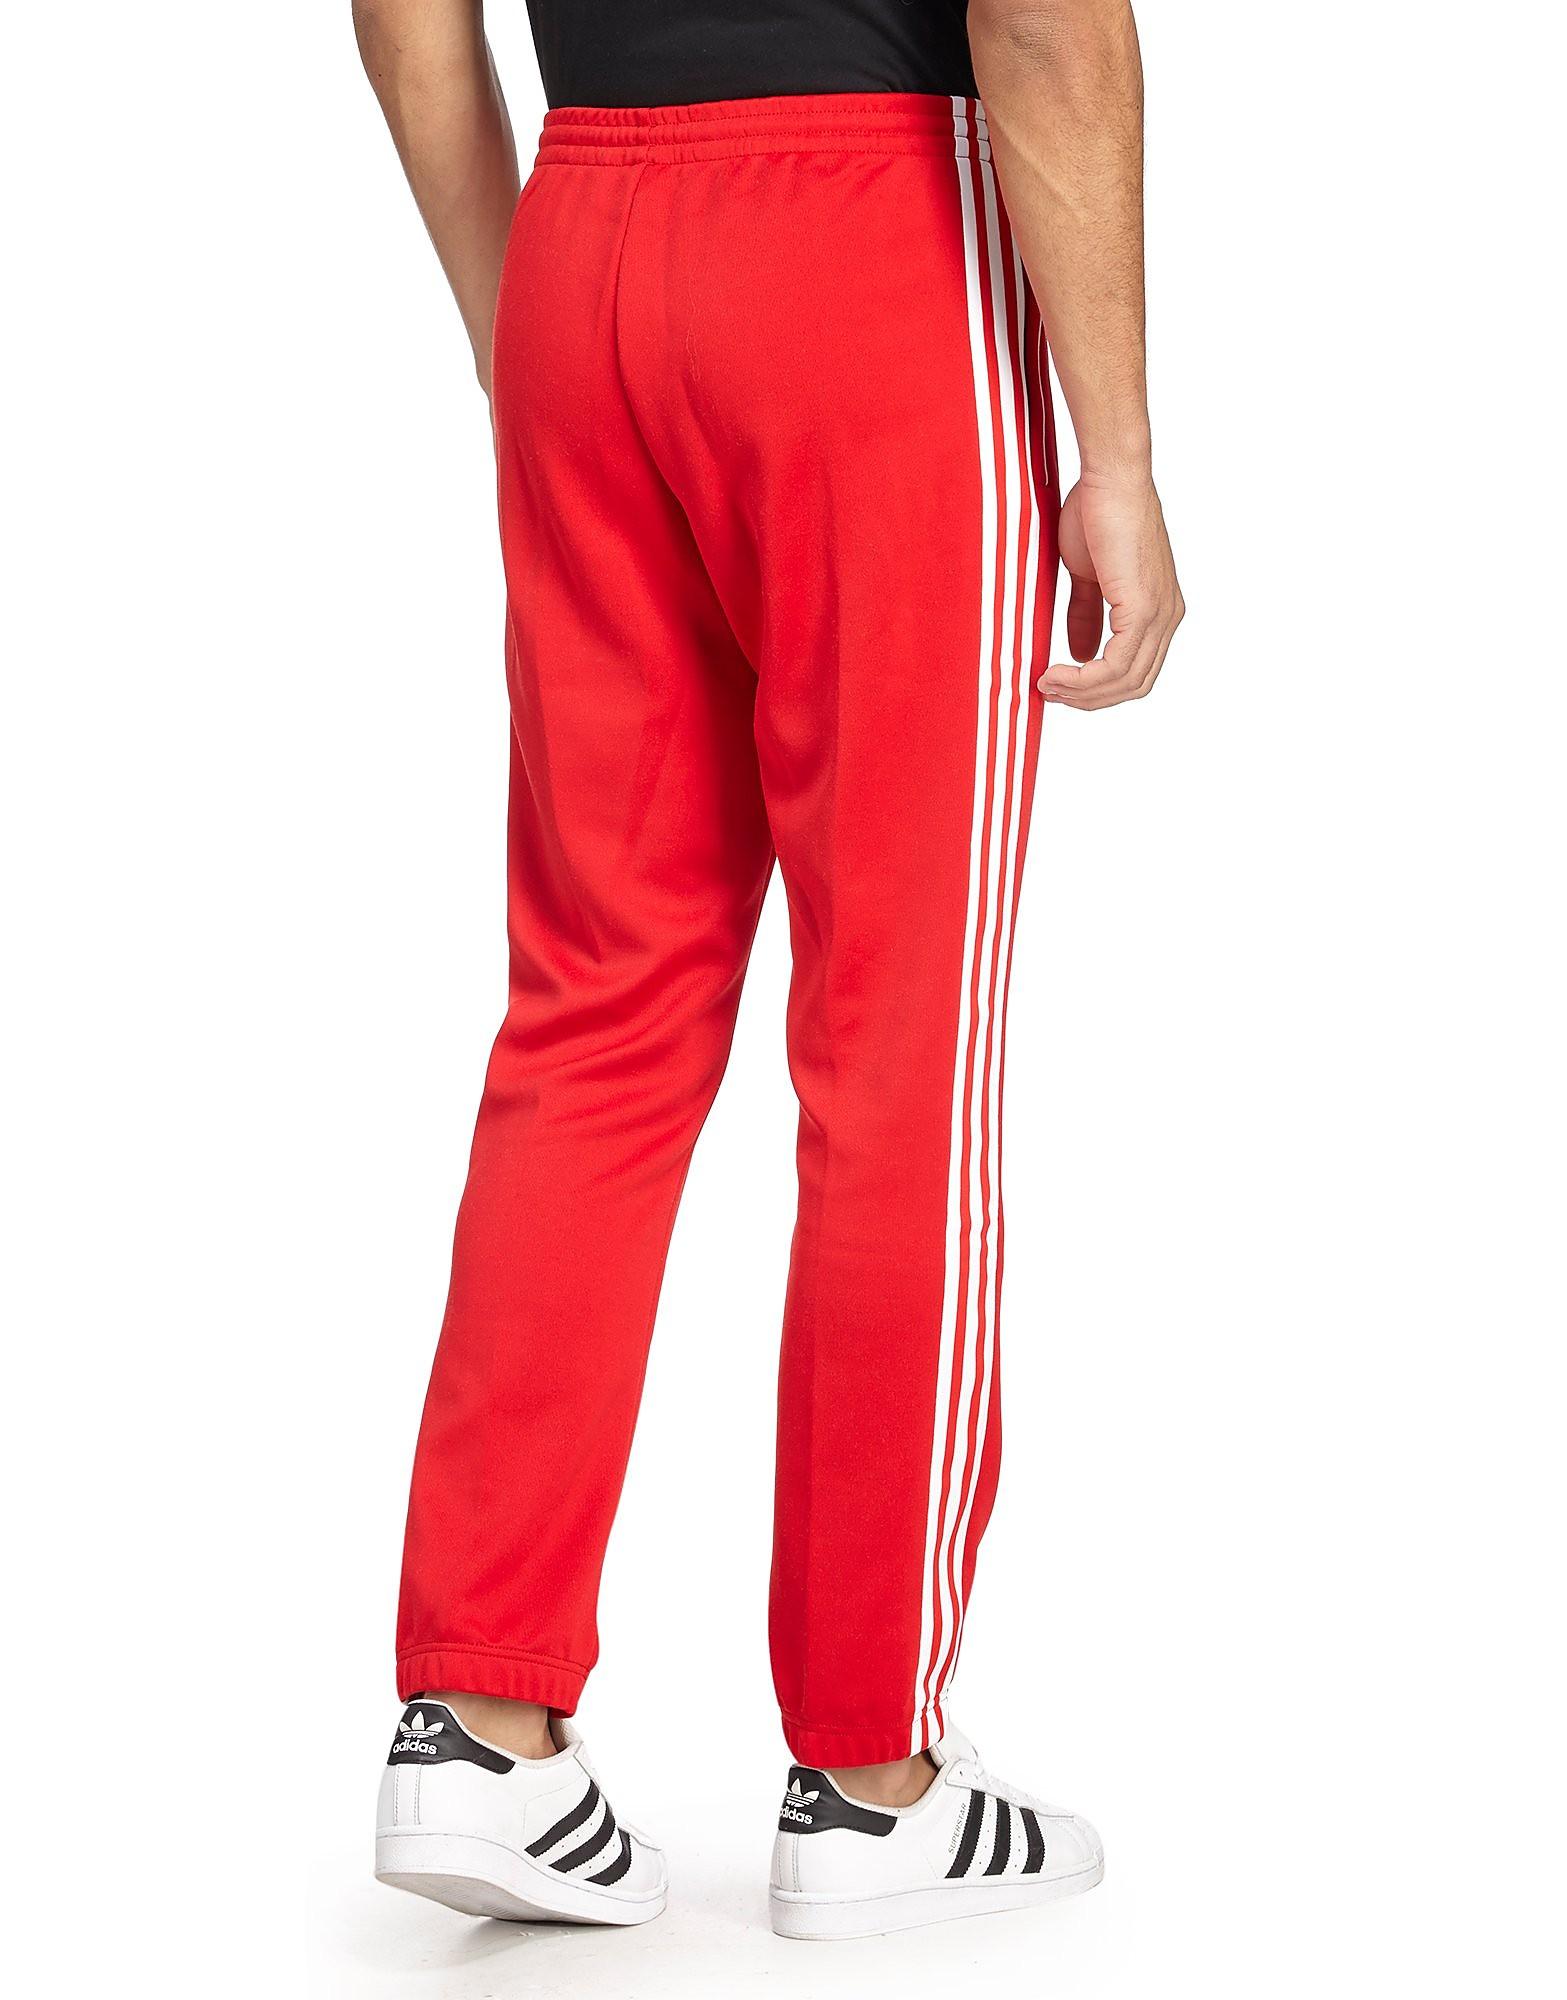 adidas Originals 3 Stripes Superstar Track Pants